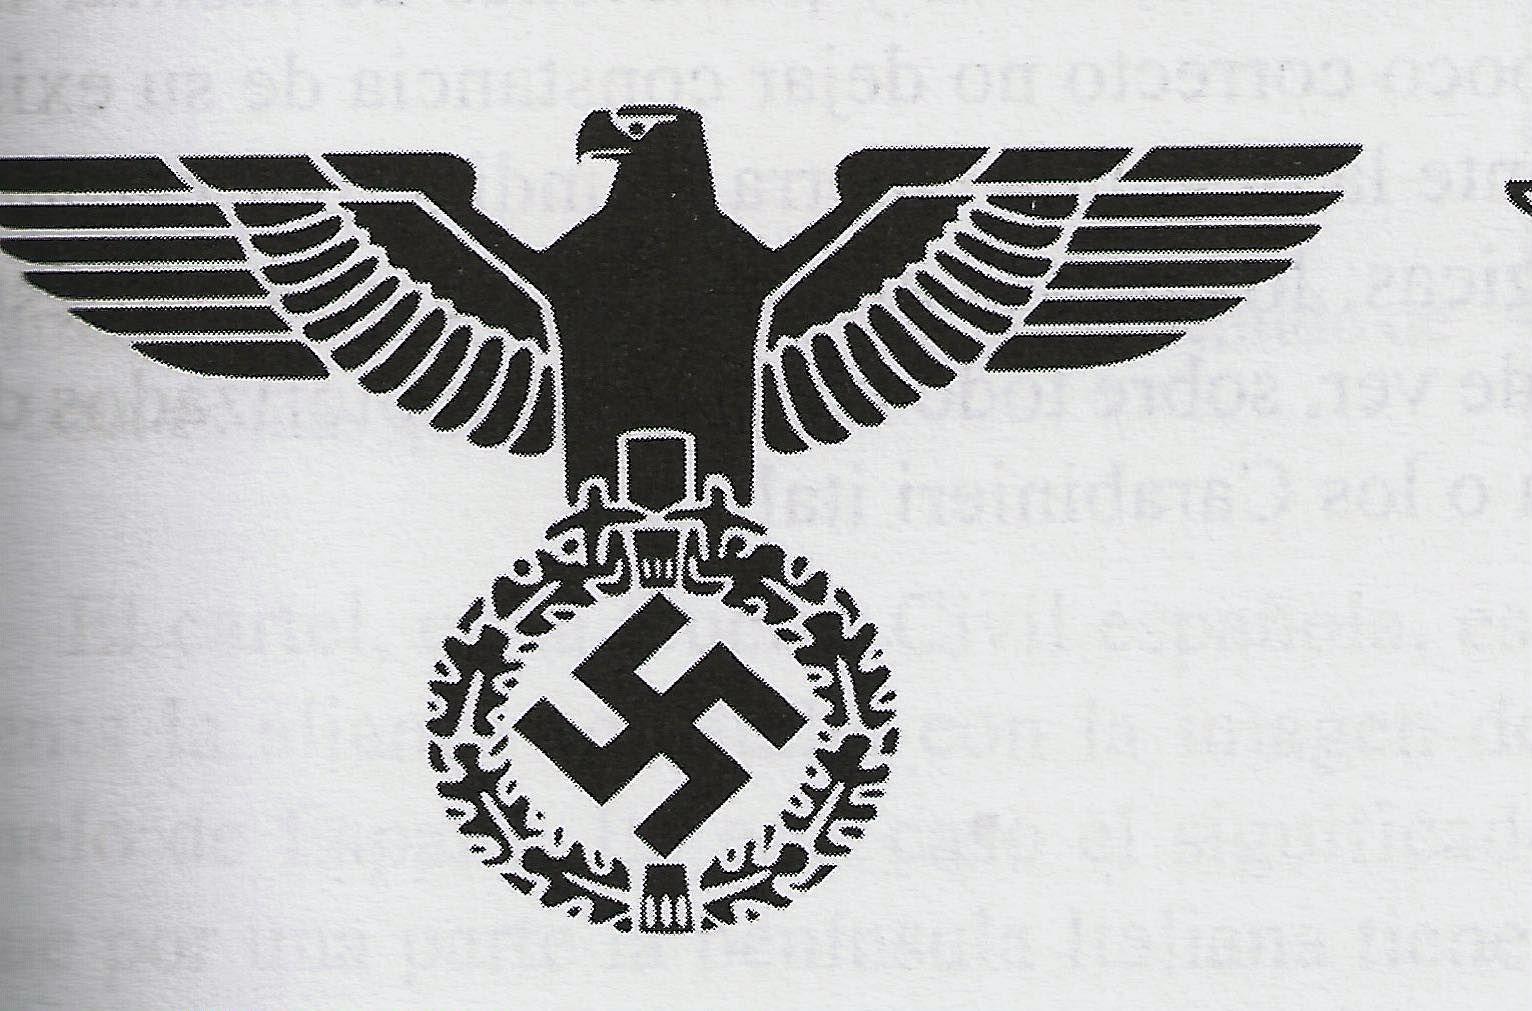 25. Águila imperial con corona de roble y esvástica diseñada por Hitler como símbolo del Partido Nacionalsocialista